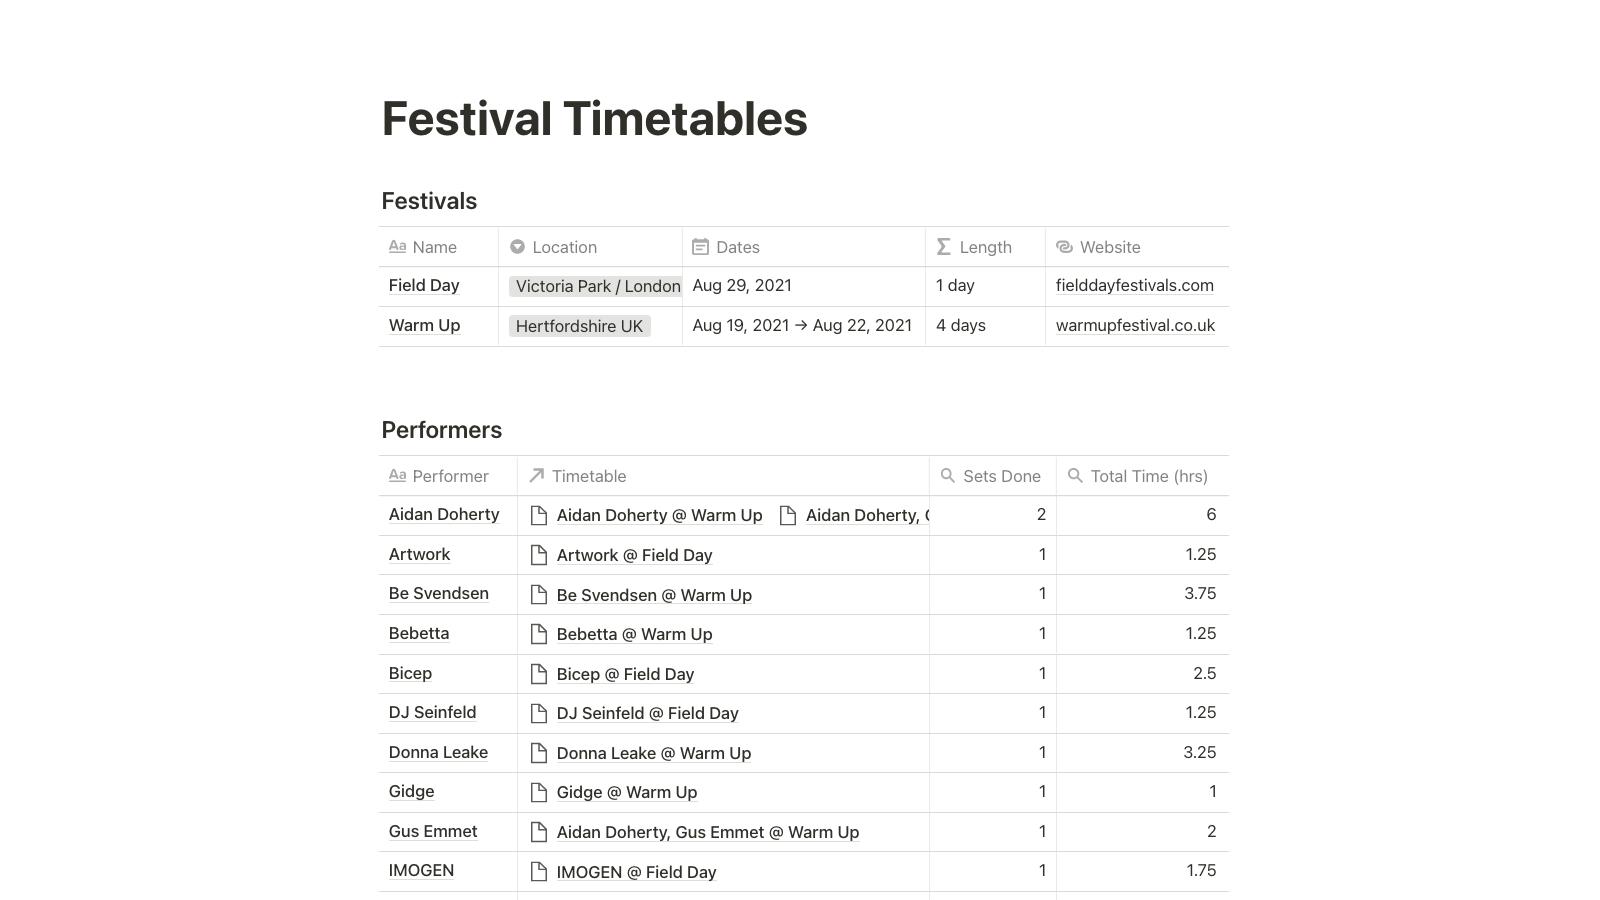 Festival Timetables